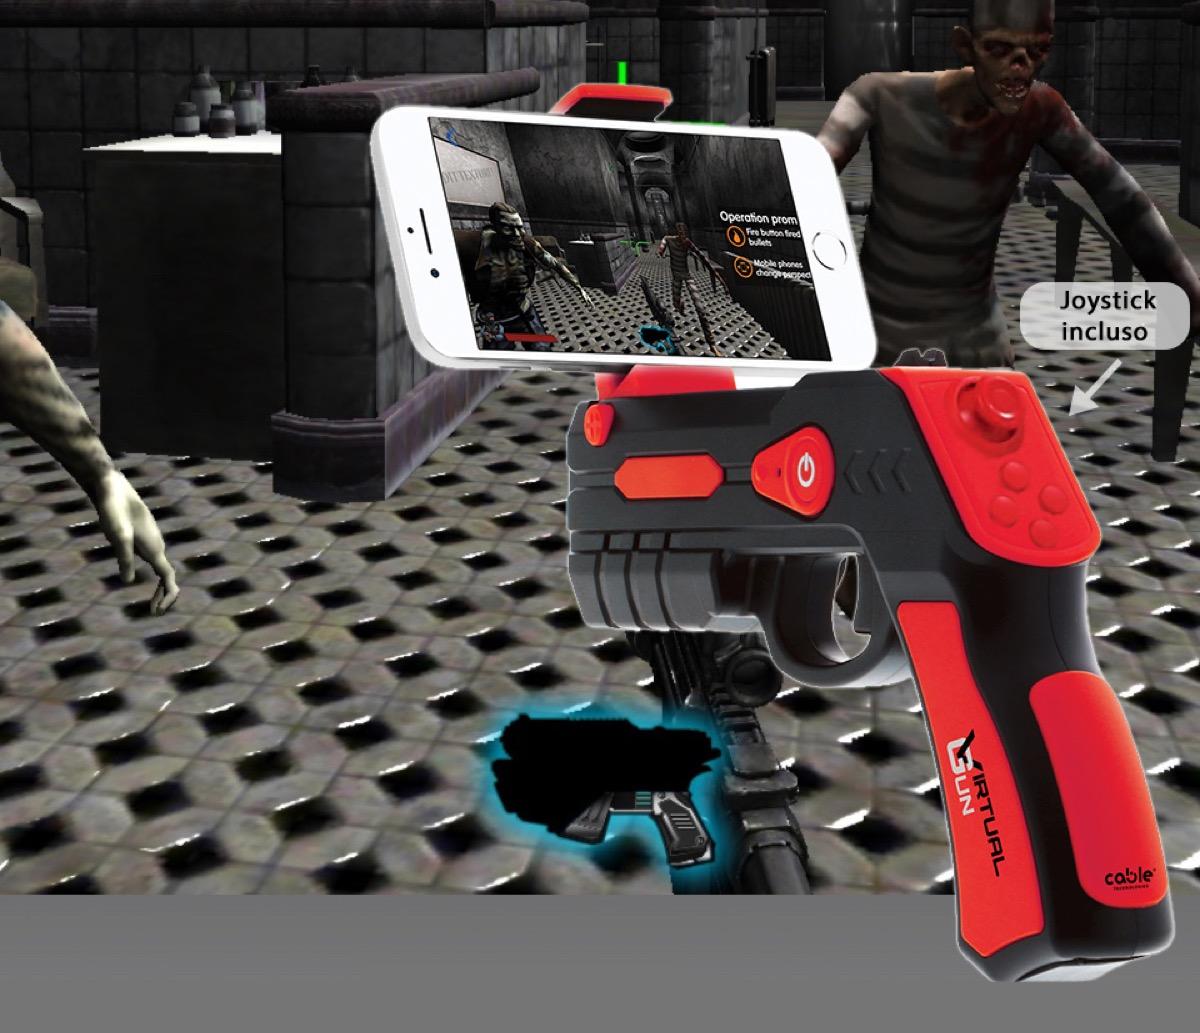 virtual gun